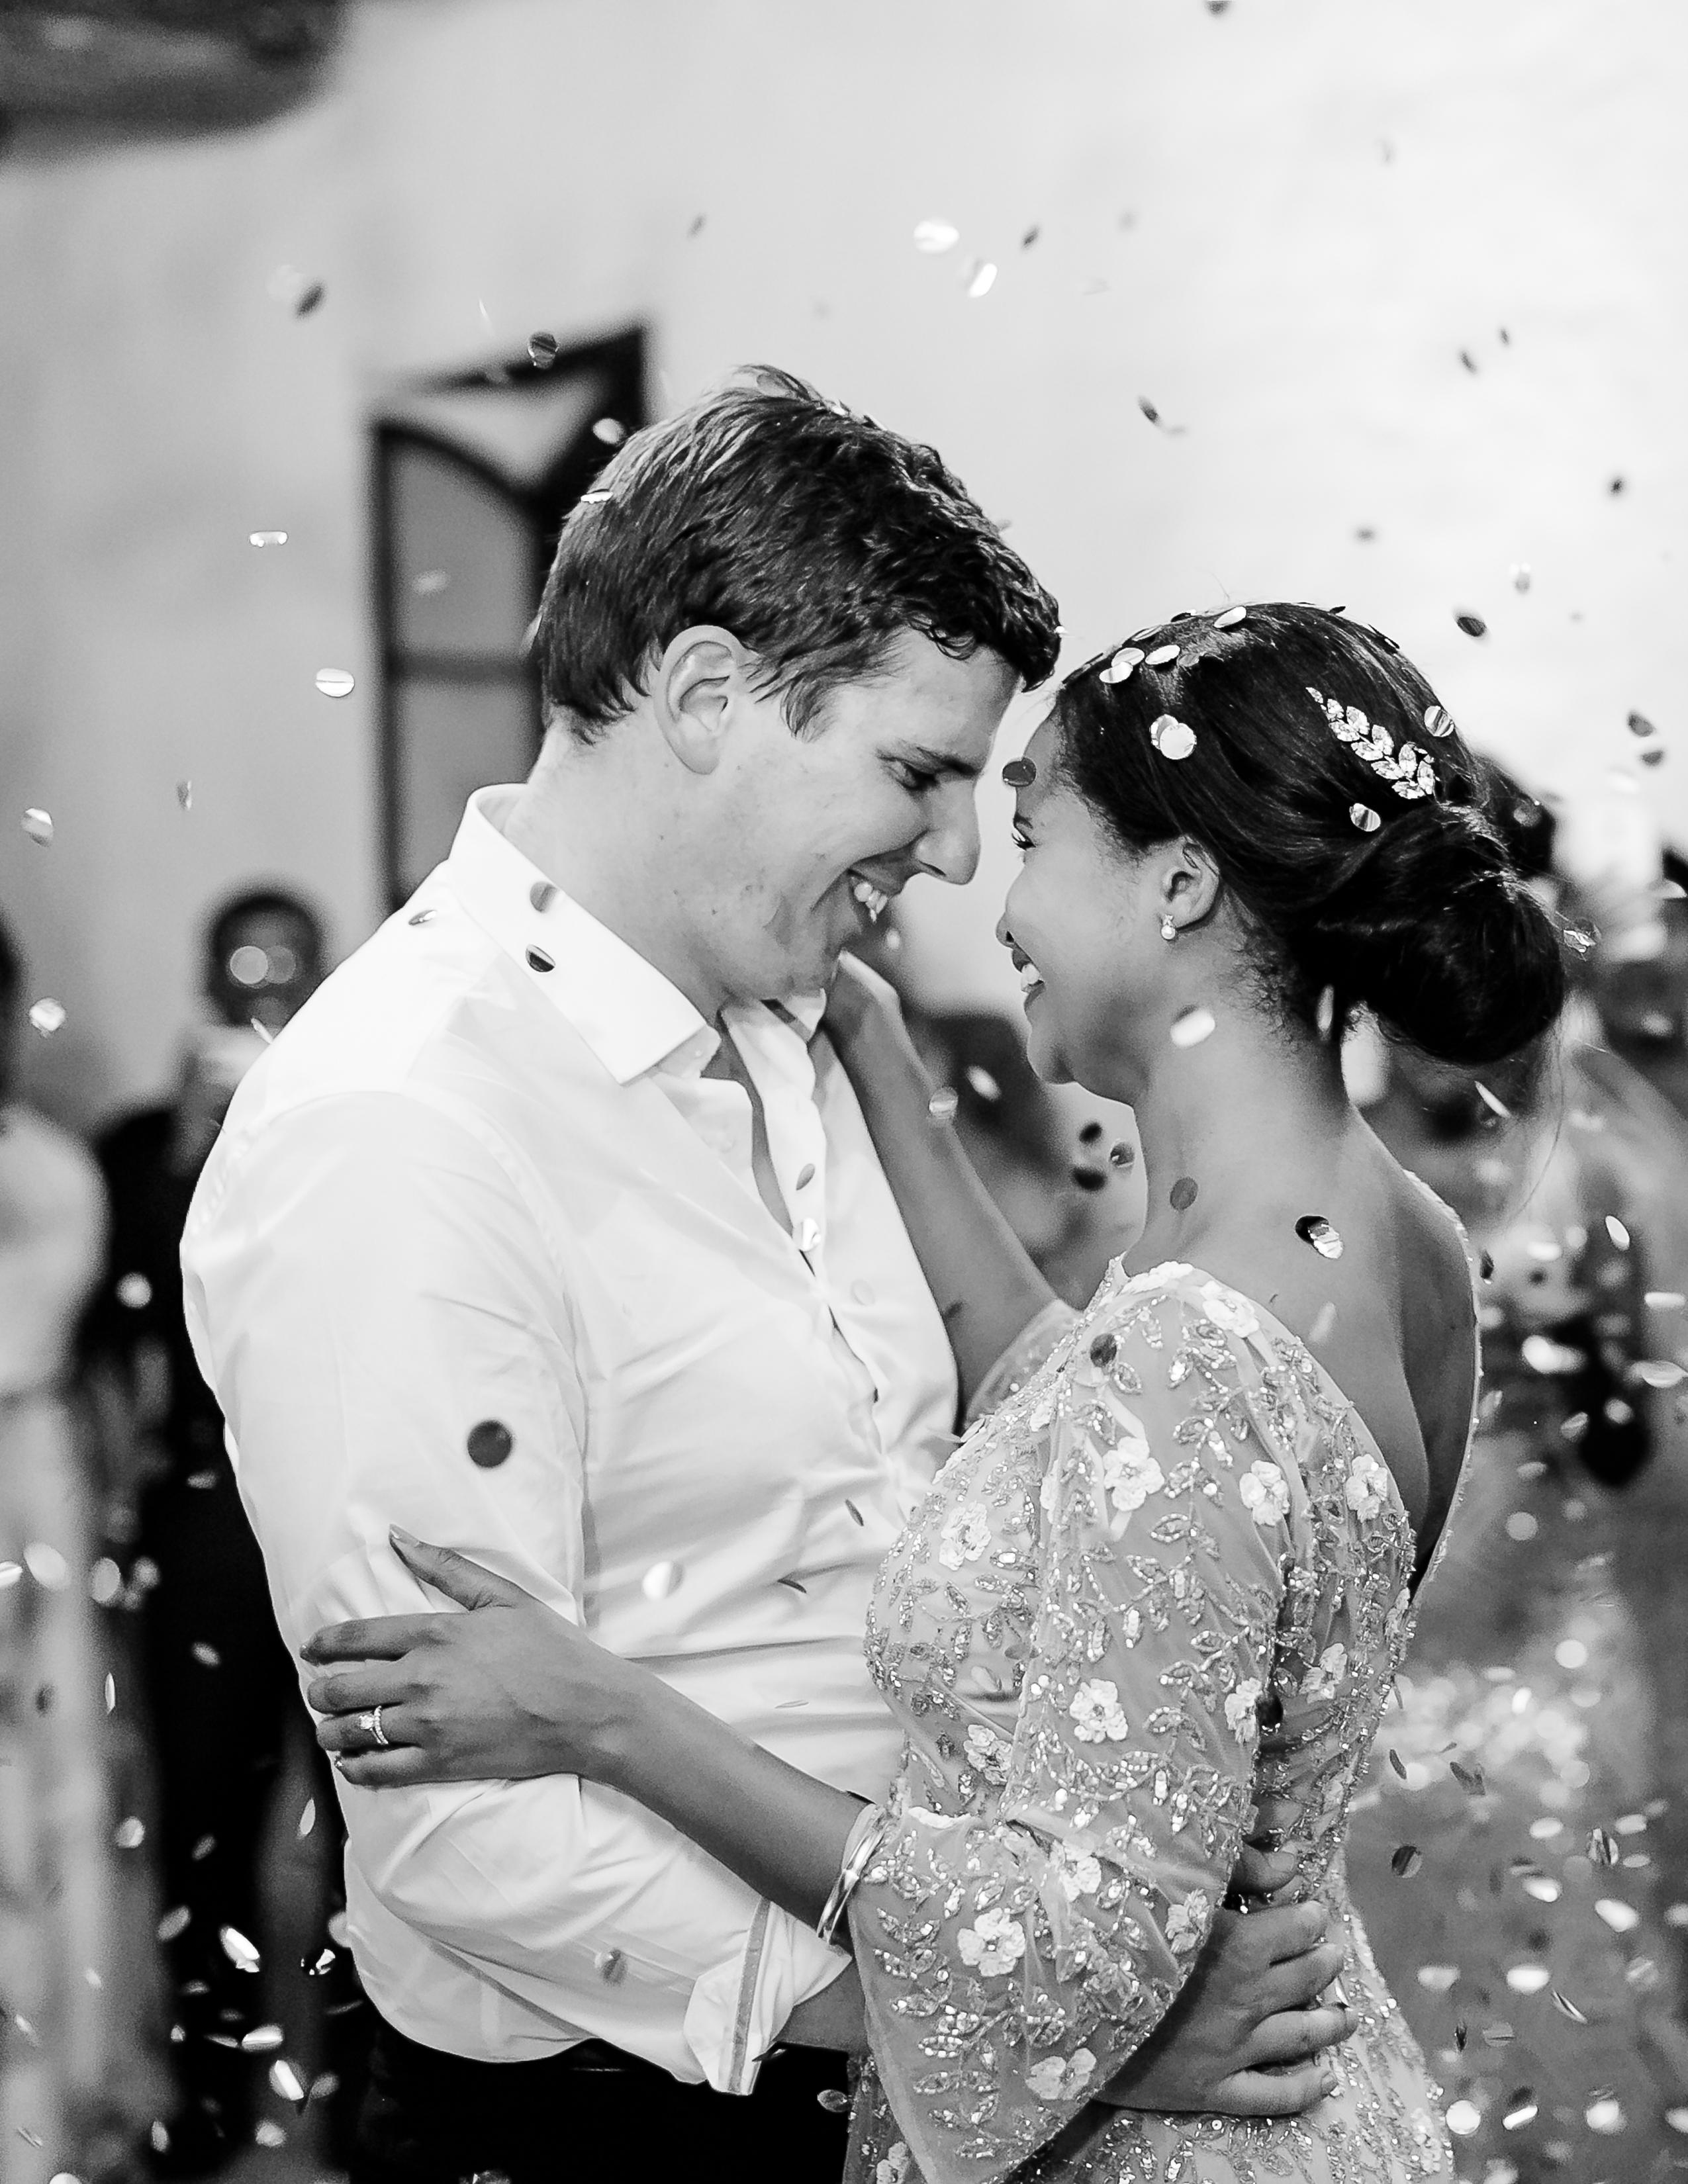 rorisang stephen wedding first dance confetti